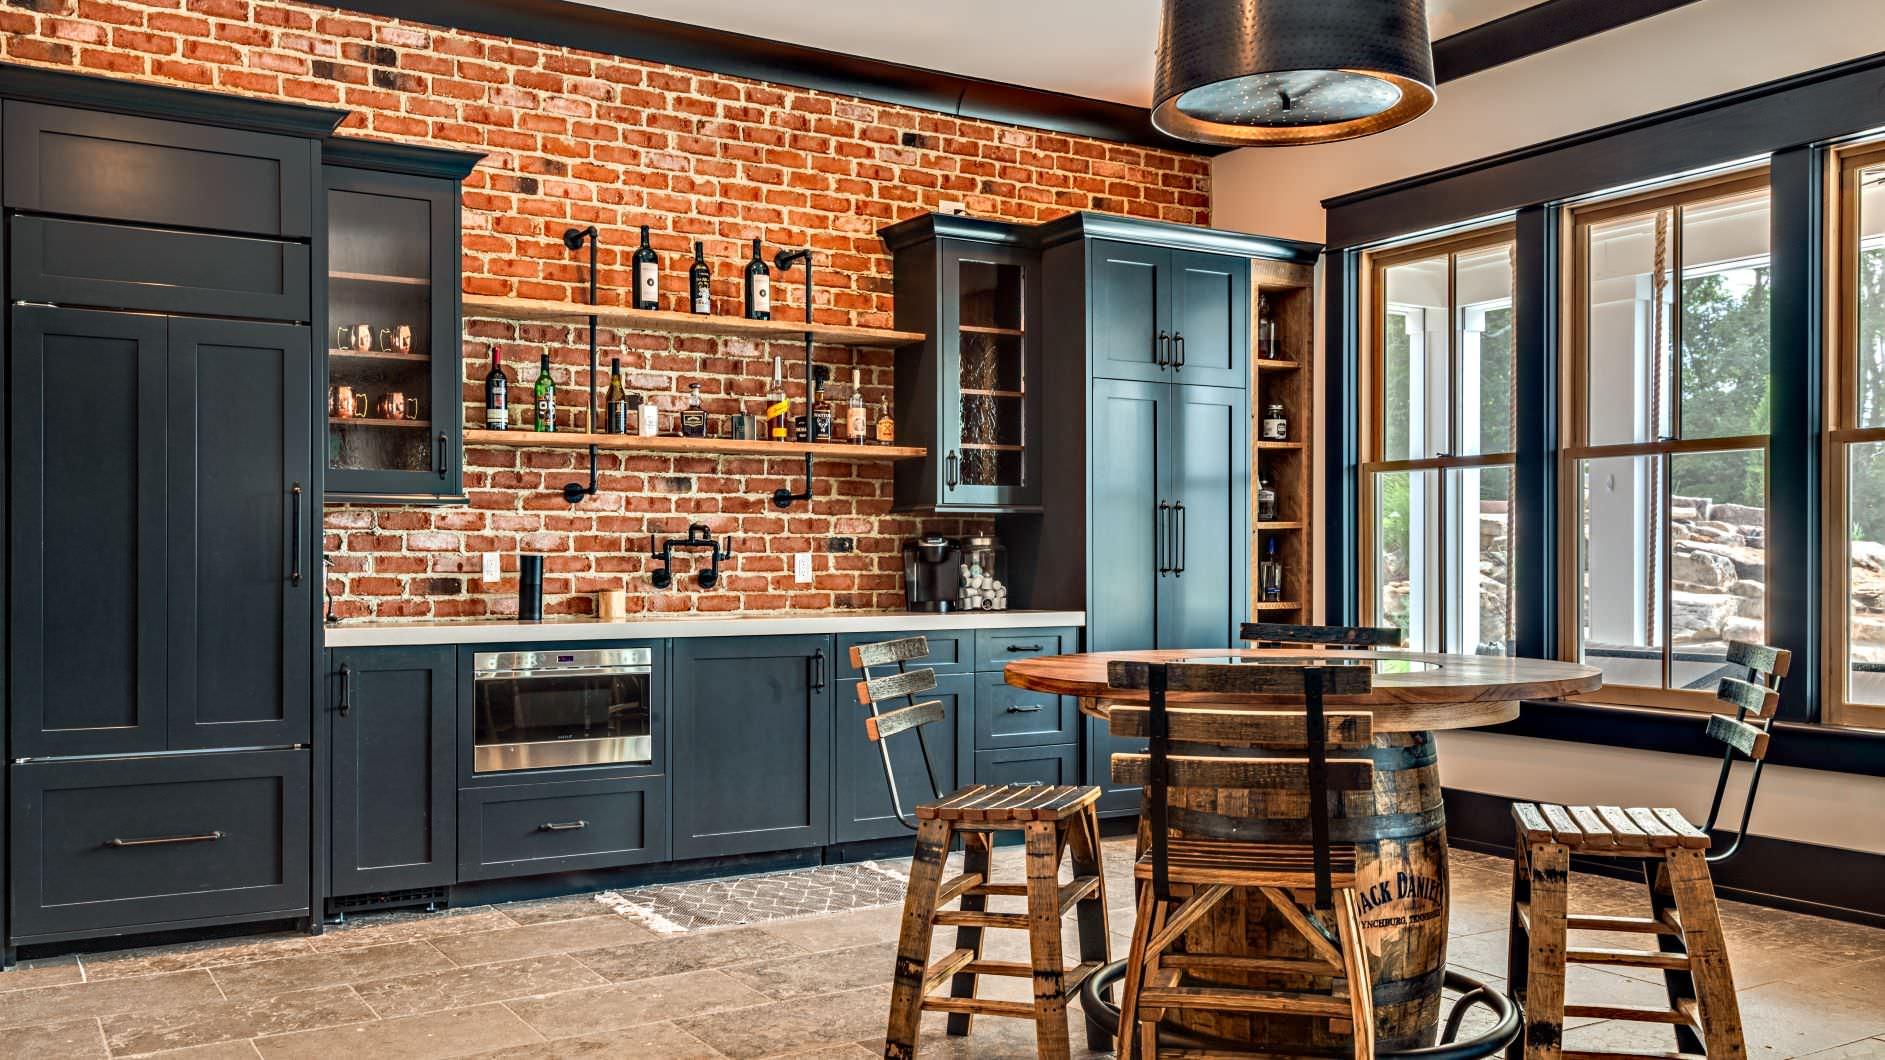 75 Beautiful Farmhouse Home Bar Pictures Ideas February 2021 Houzz